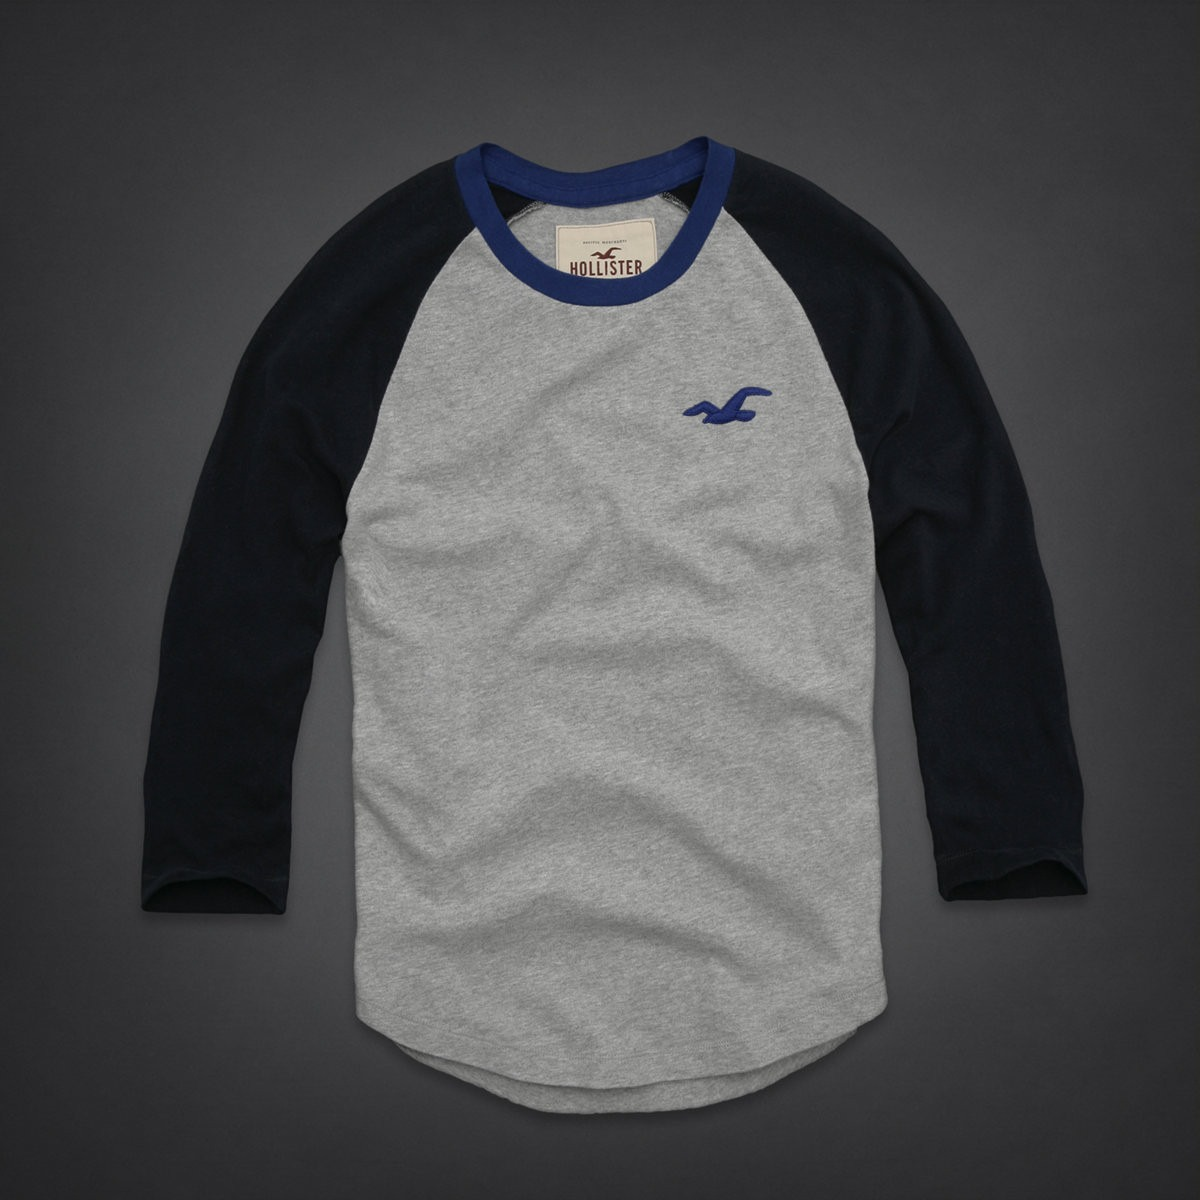 Hollister abercrombie camiseta camisa blusa masculina eua Hollister design